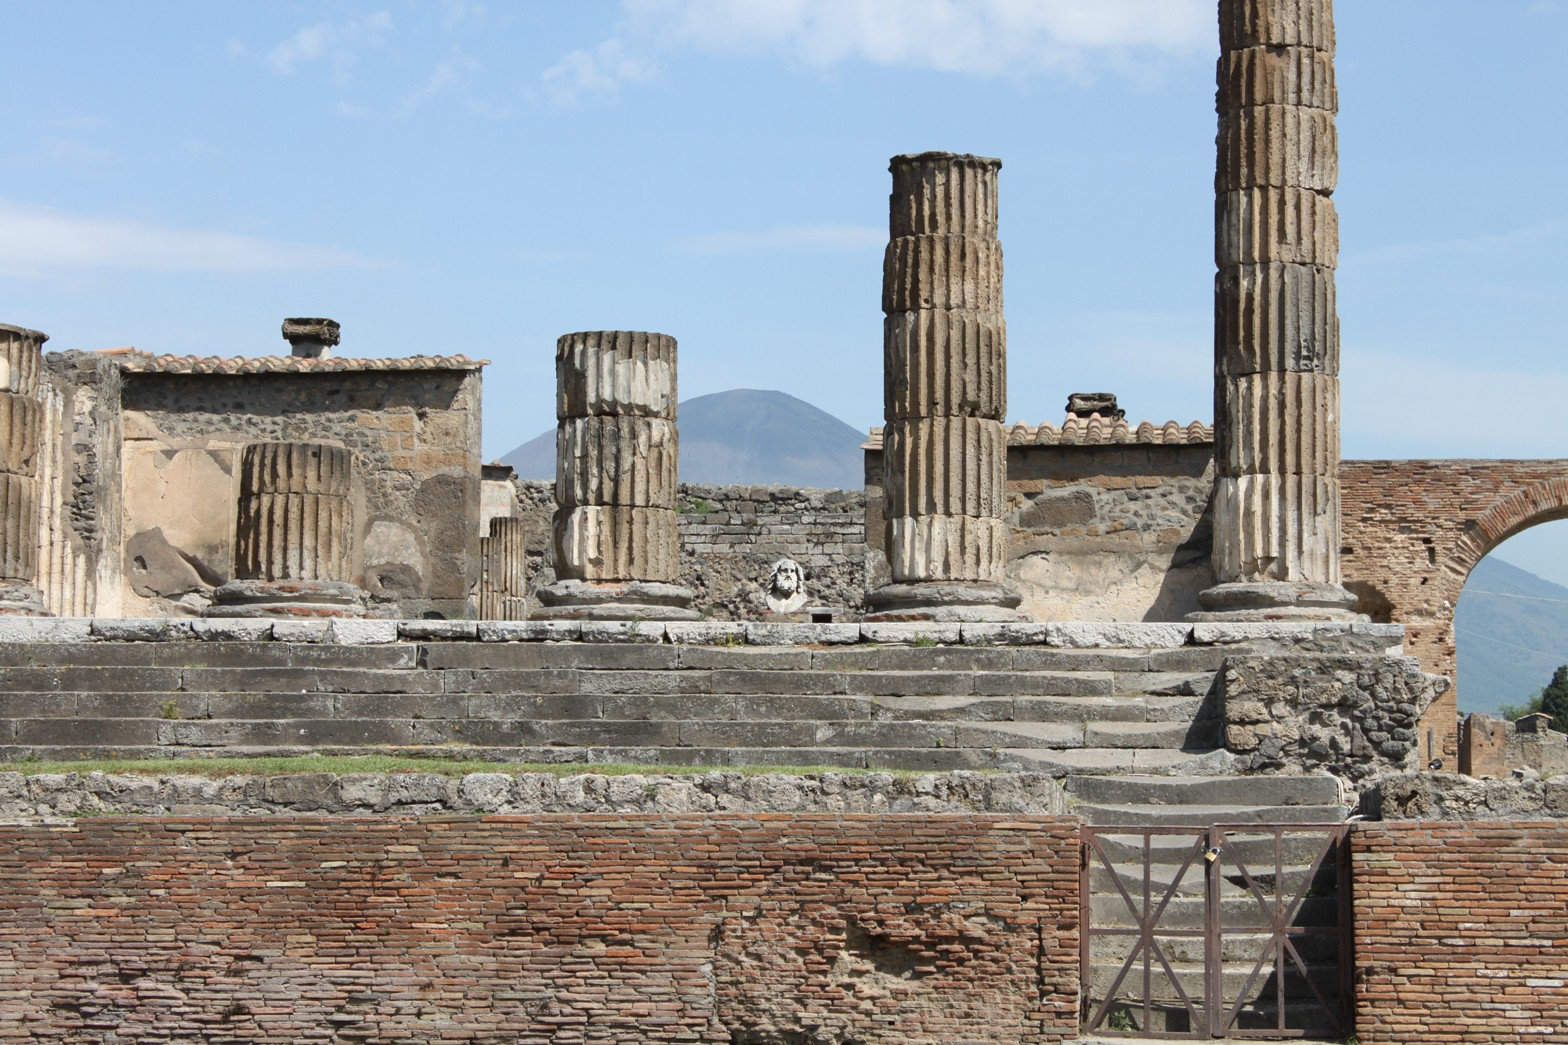 Temple of Jupiter - Pompeii